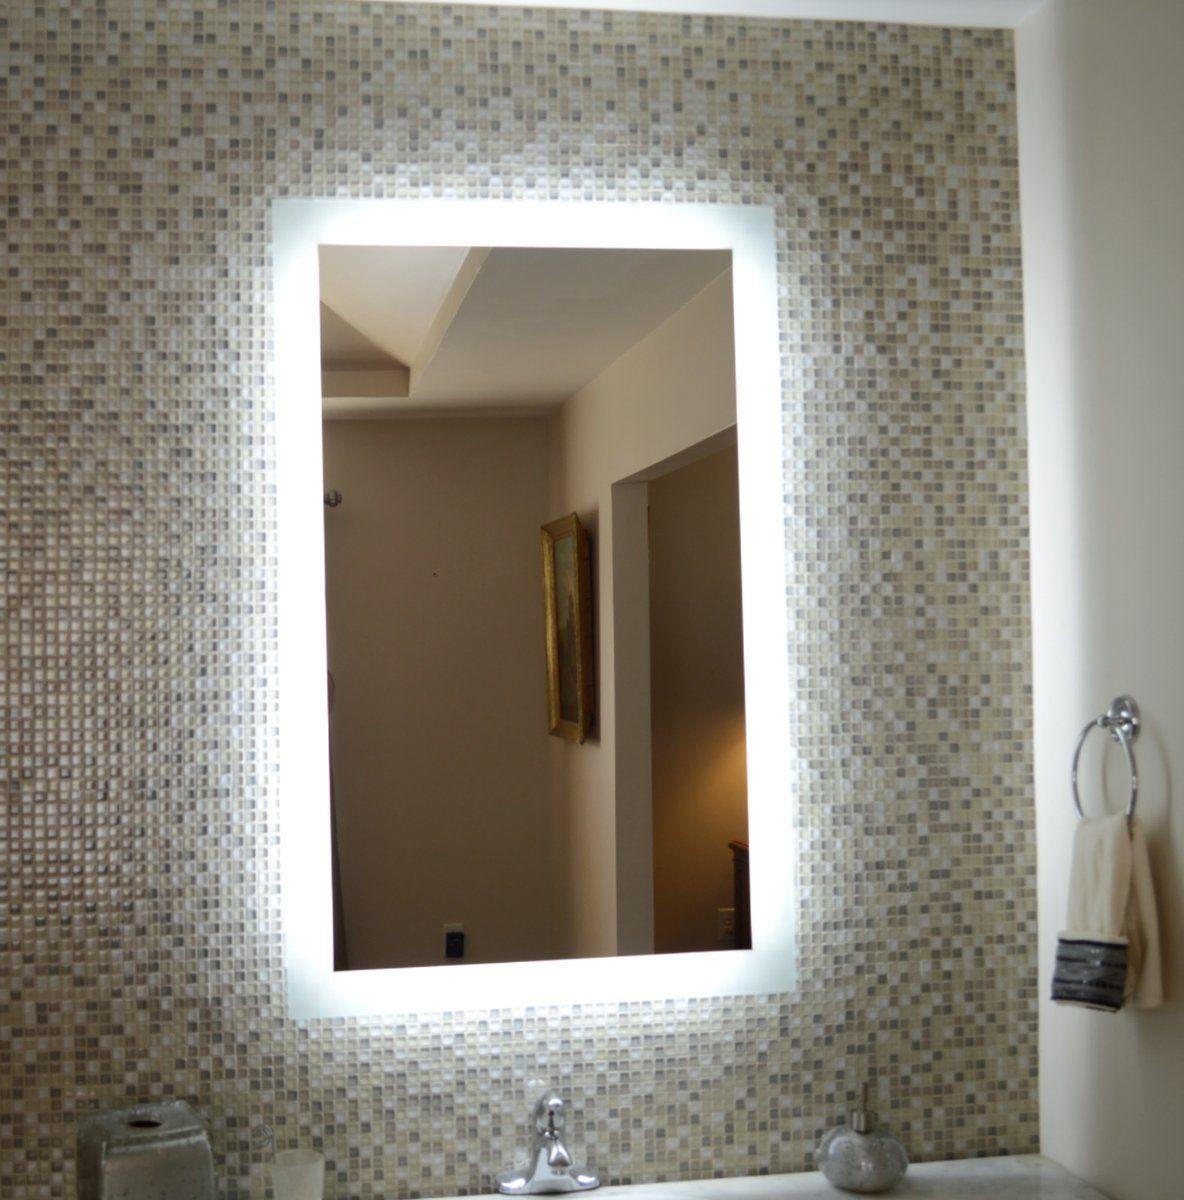 Side Lighted Led Bathroom Vanity Mirror 28 Wide X 44 Tall